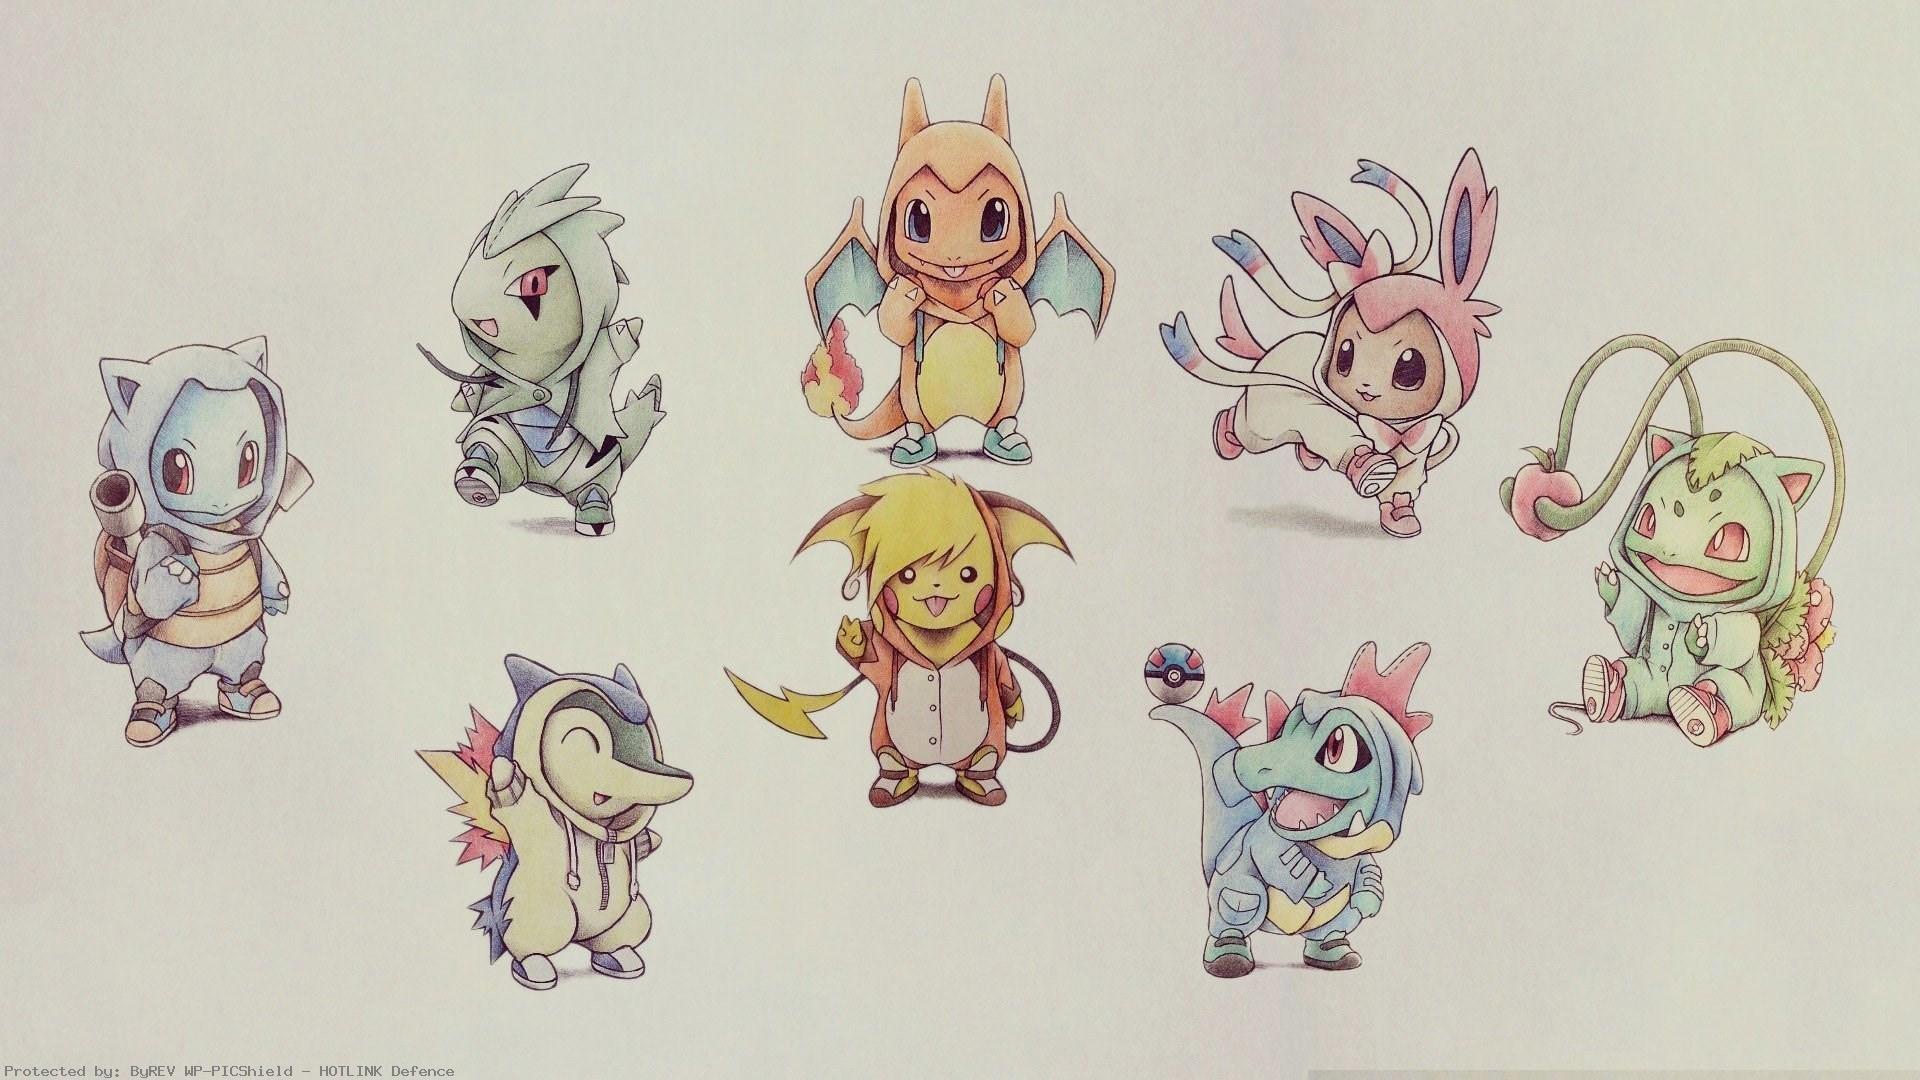 pokemon-phone-eevee-image-hd-wallpaper-wpc9008585